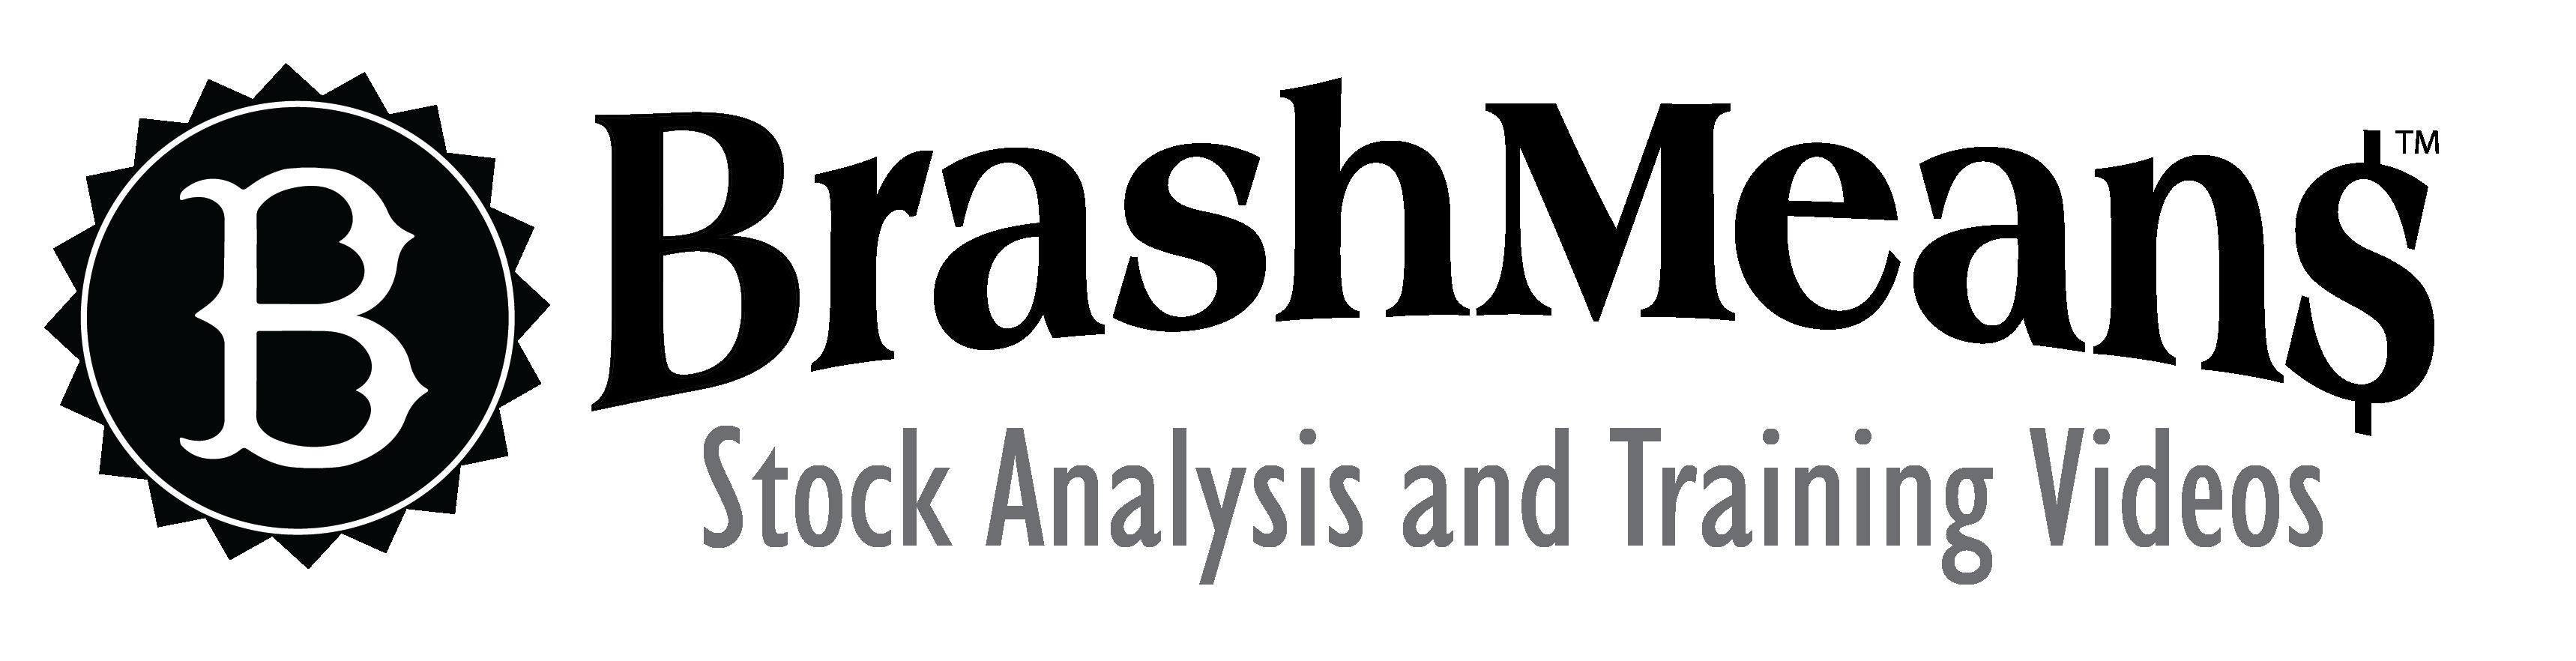 Stock Analysis and Training Videos